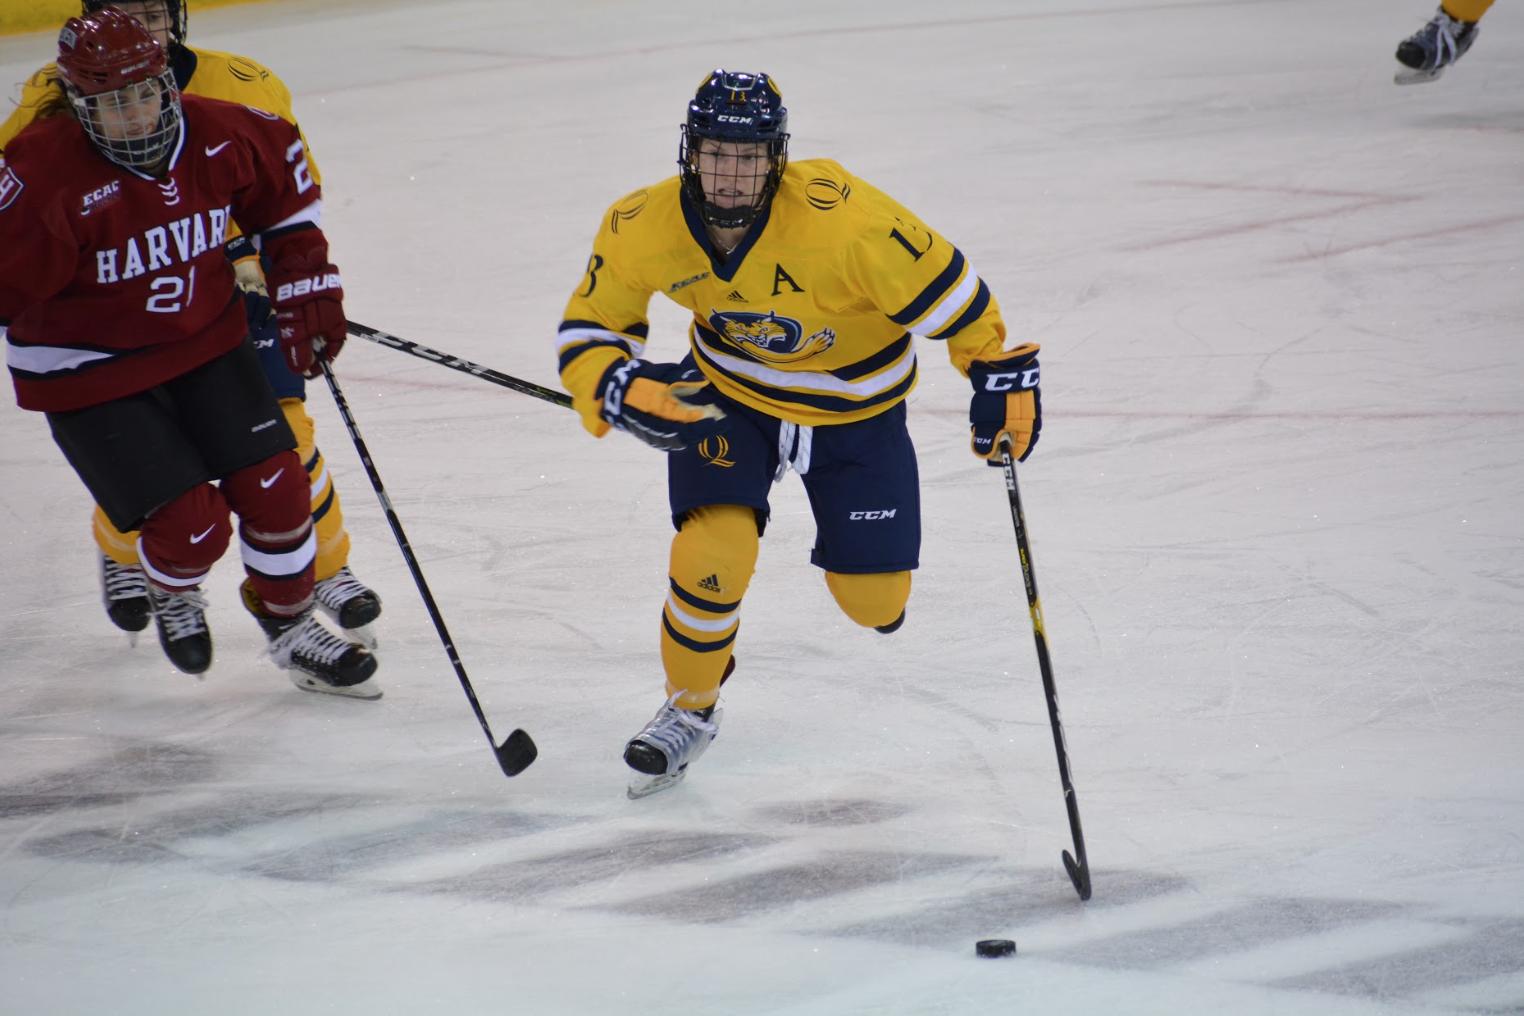 Quinnipiac women's ice hockey edges Harvard, 1-0